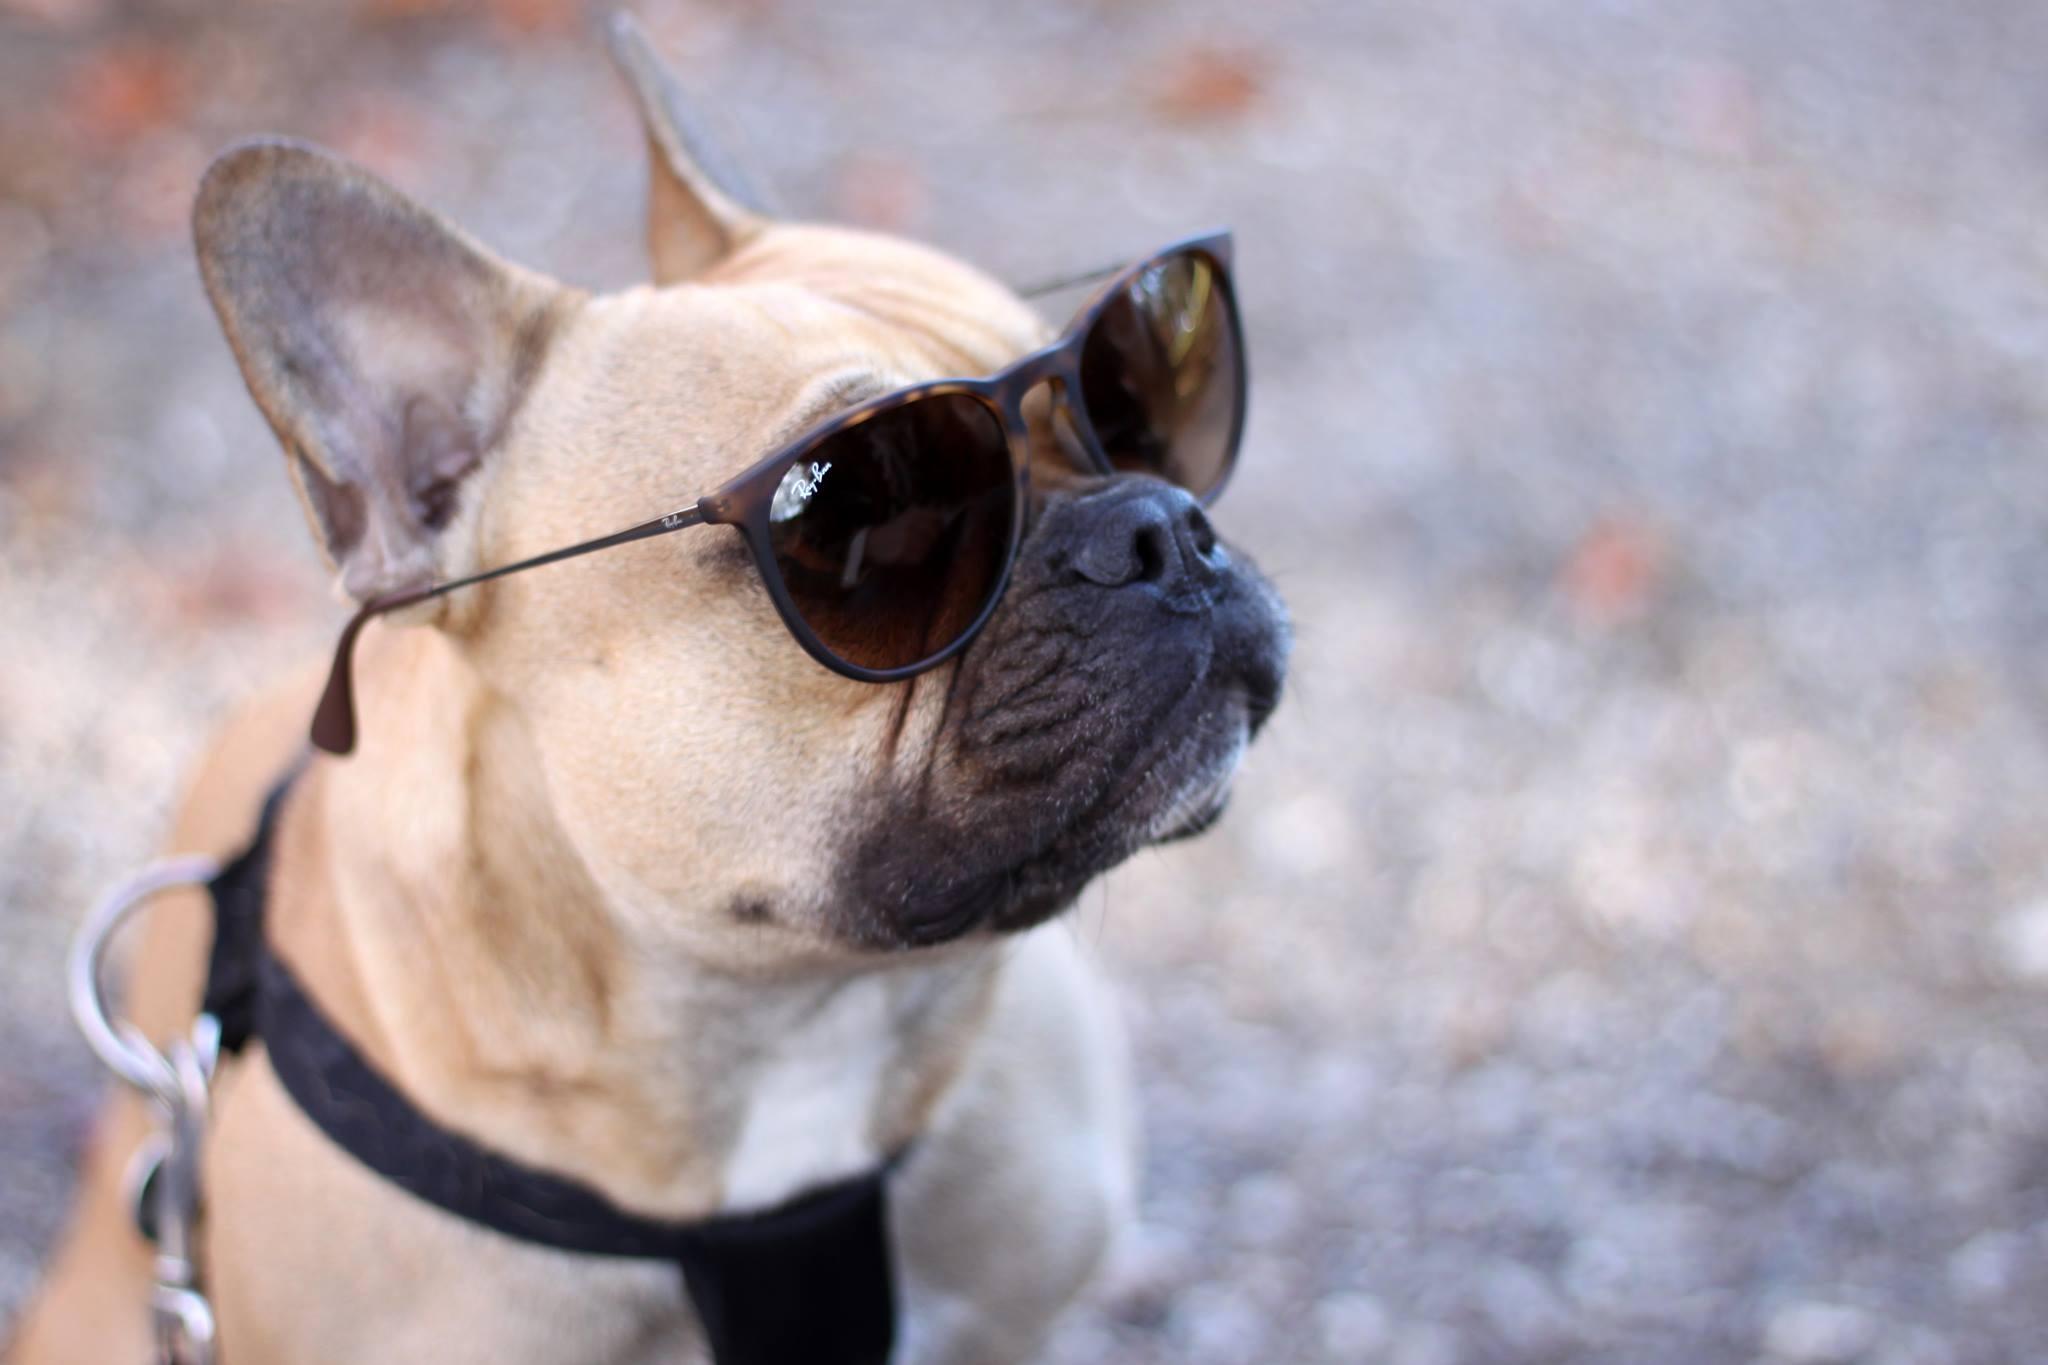 who is mocca, blogger tirol, ray ban, sonnenbrille, erika, aviator, giveaway, gewinnspiel, blogger gewinnspiel, franzoesische bulldogge, sunglassesshop